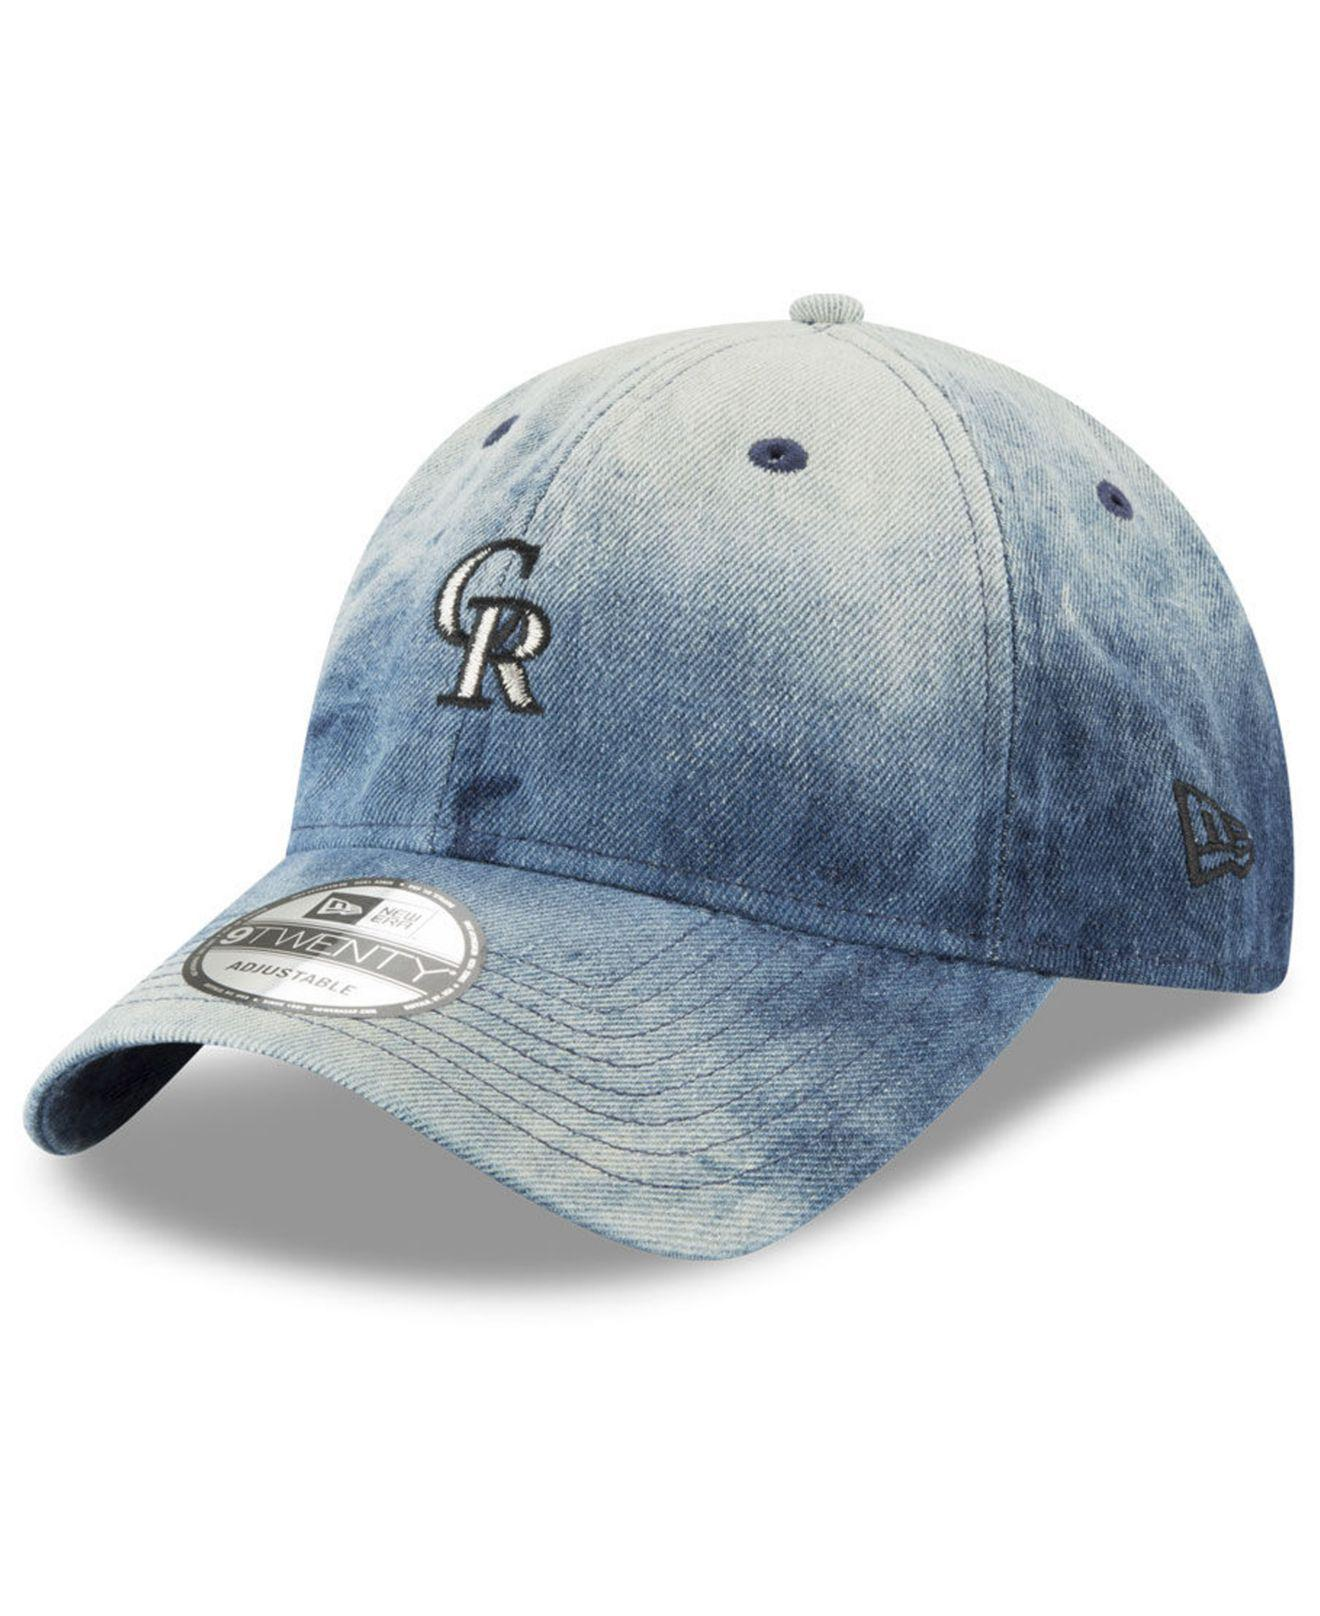 purchase cheap ce370 0e162 ... new era mlb batting practice prolight 39thirty cap 20953129 online sale  7332d 80dc2  australia ktz. mens blue colorado rockies denim wash out  9twenty ...